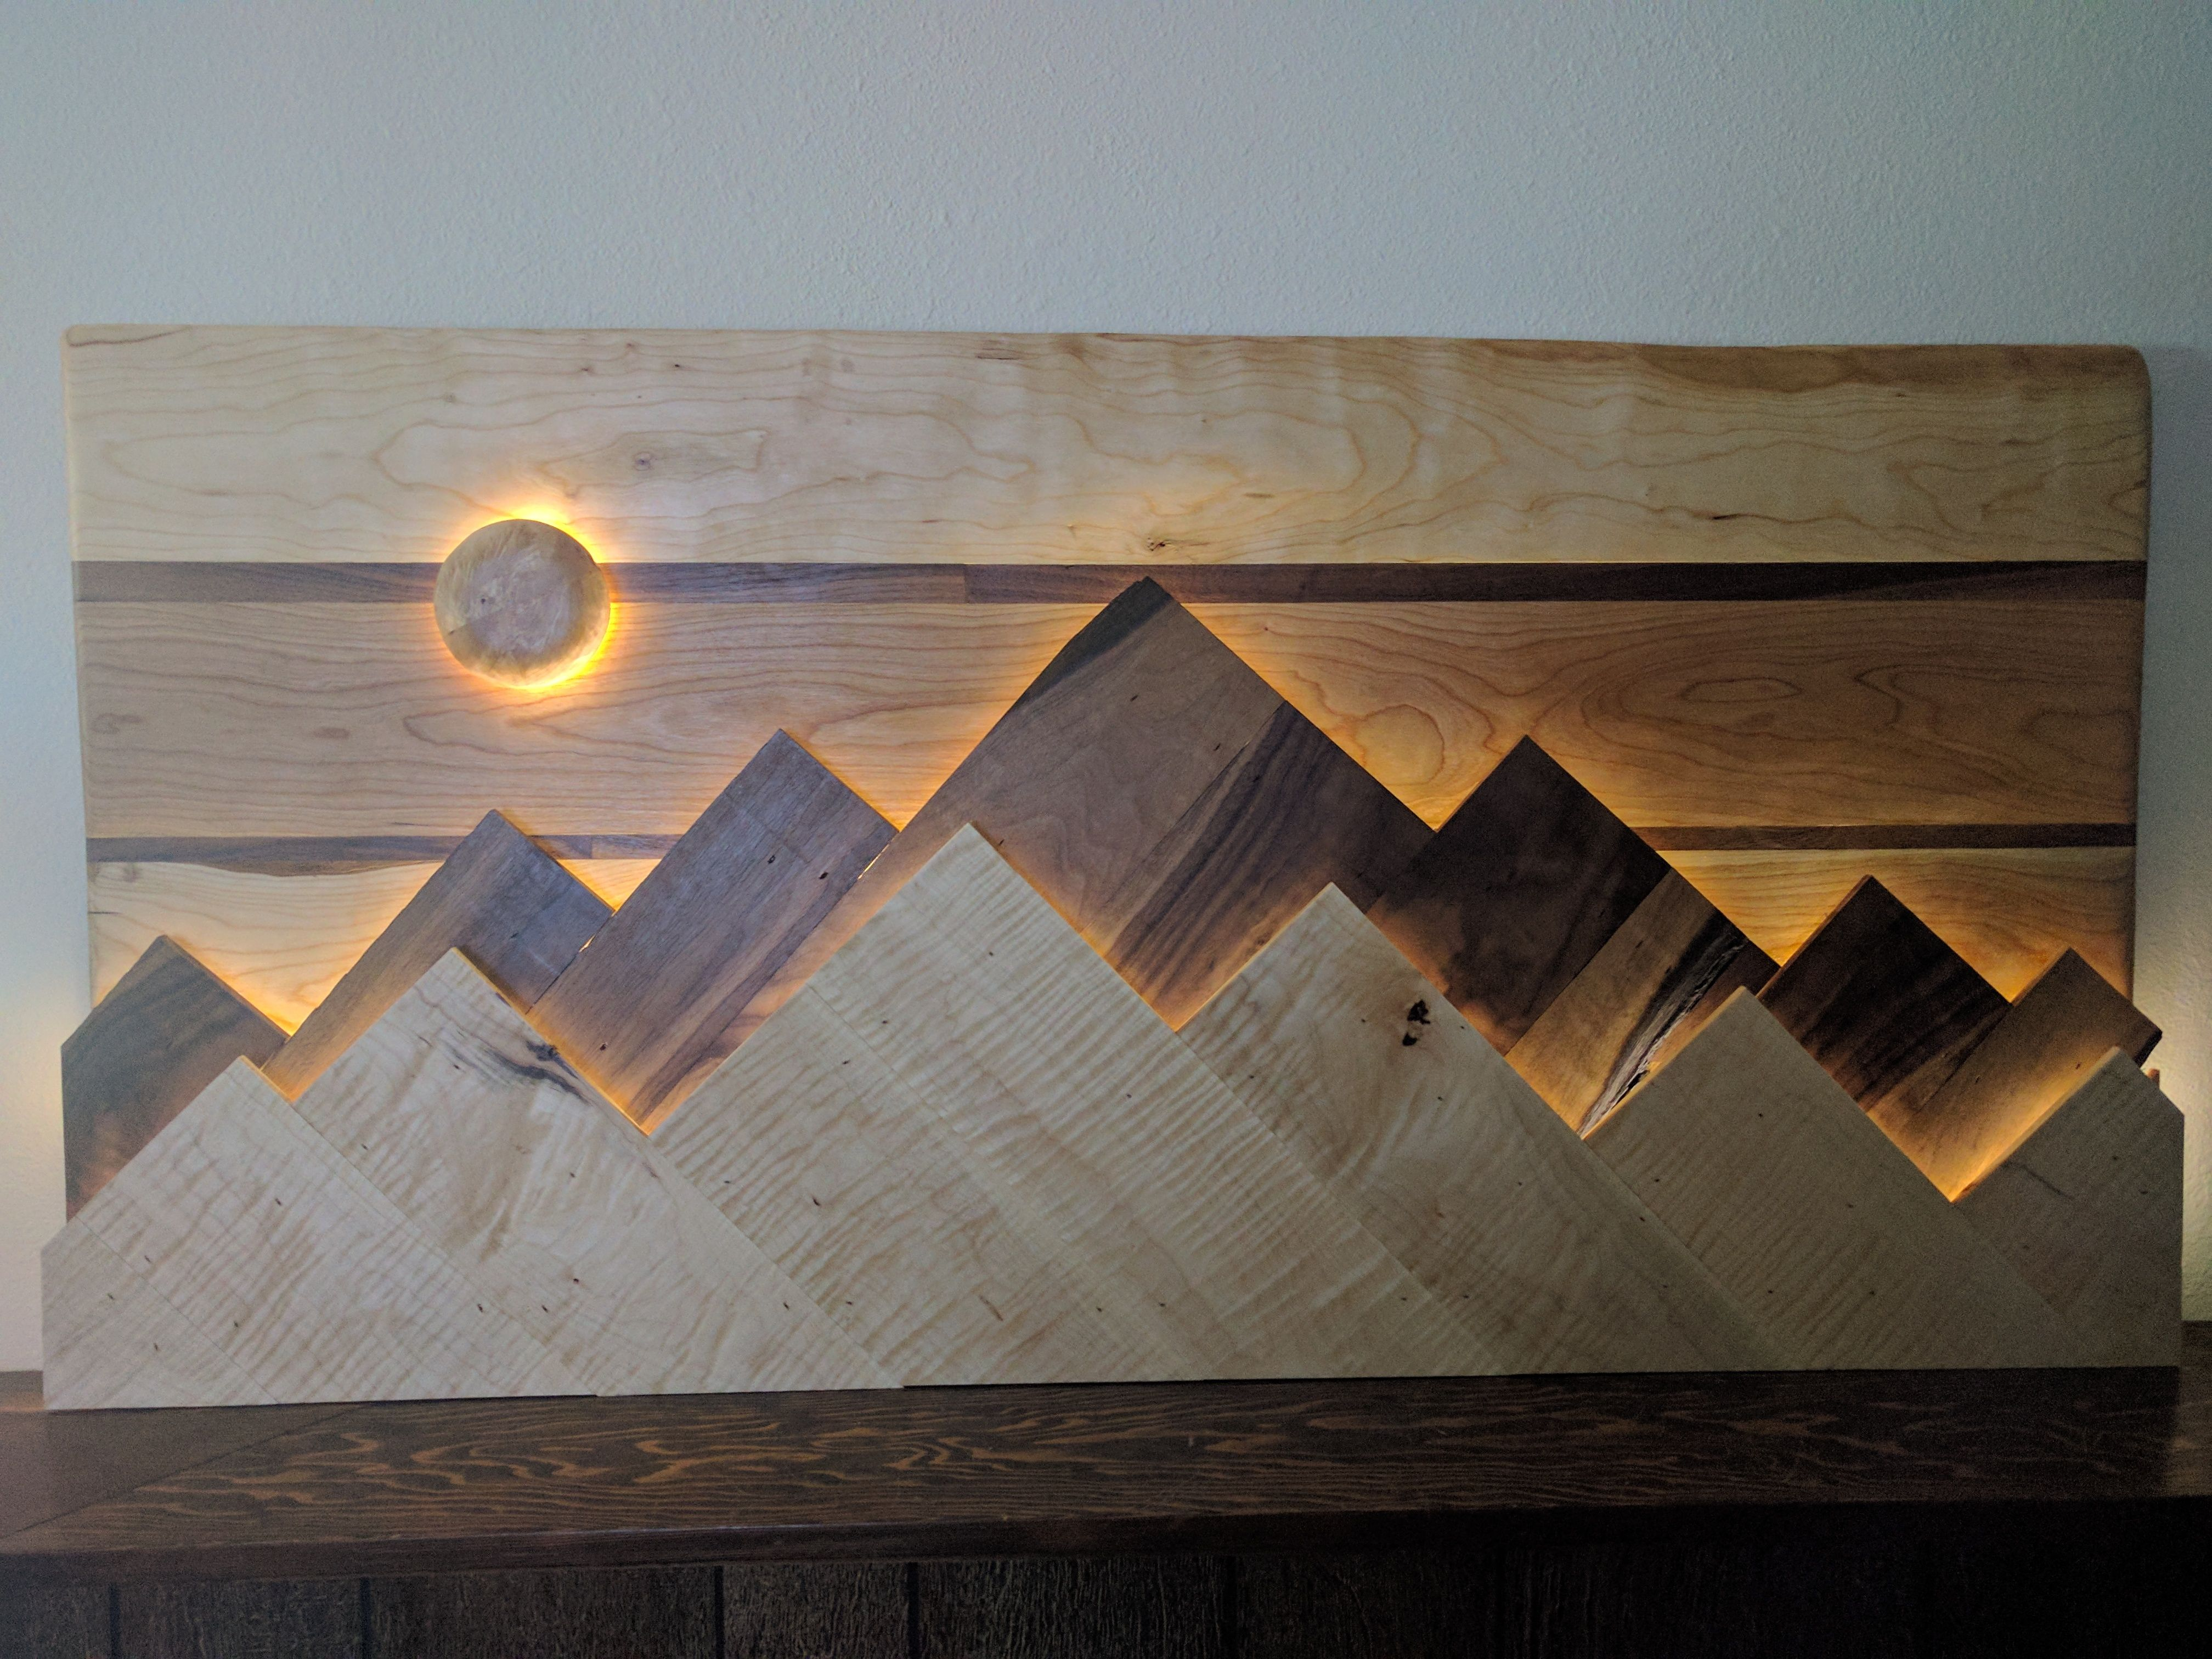 Wood Mountain Range Wall Art The Sun Moon Functions As A